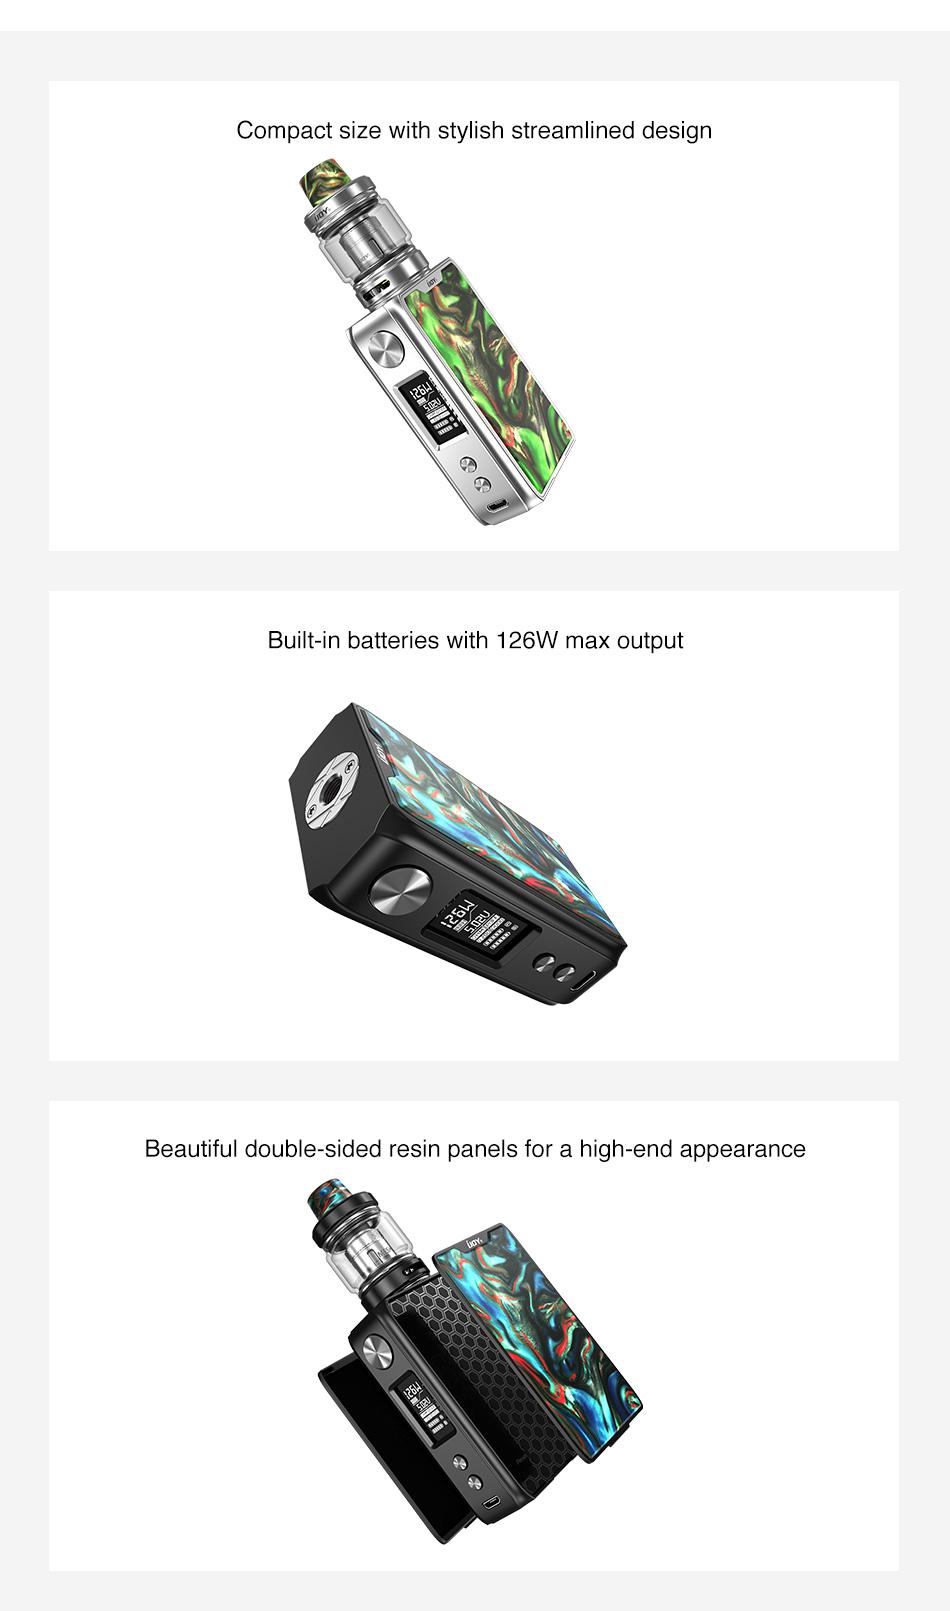 , Newest Original IJOY Shogun JR Resin 126W TC Kit 4500mAh Battery & 2ml/6ml Shogun Tank Ecig Vape Kit VS Shougun Univ/ Drag 2